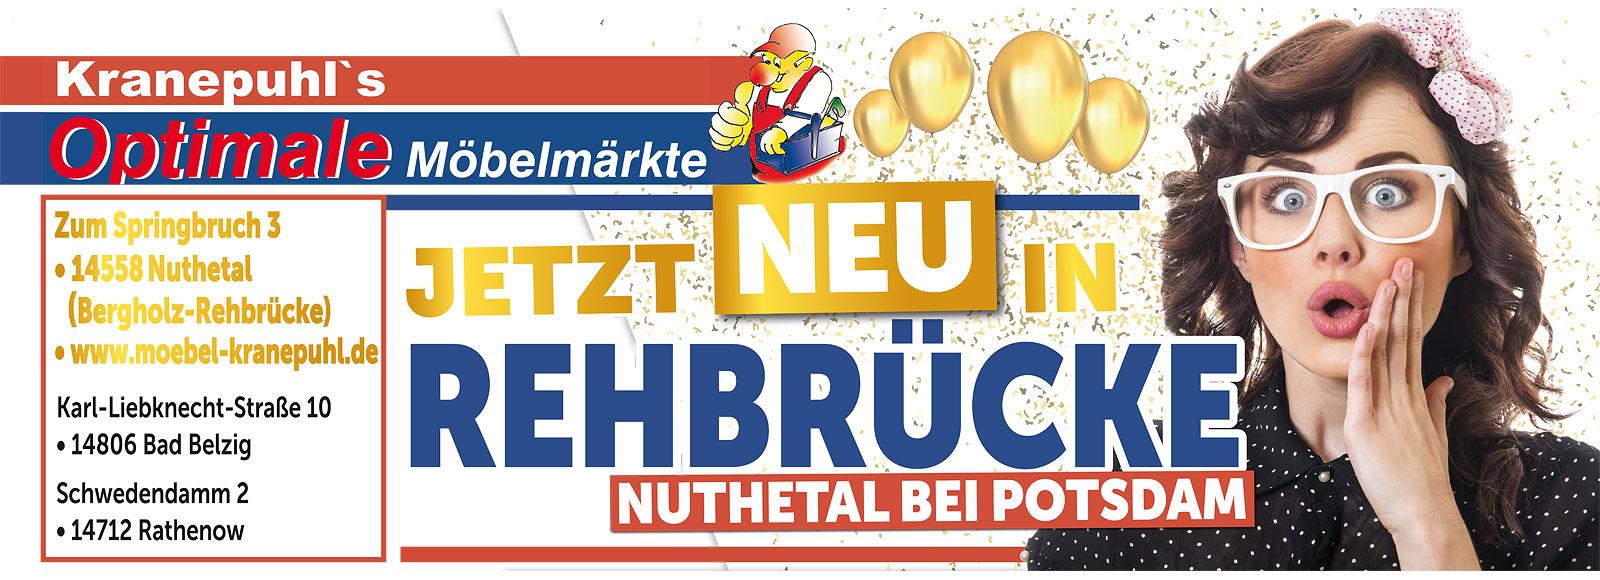 Neueröffnung in 14558 Nuthetal bei Potsdam - Kranepuhl's Optimale Möbelmärkte